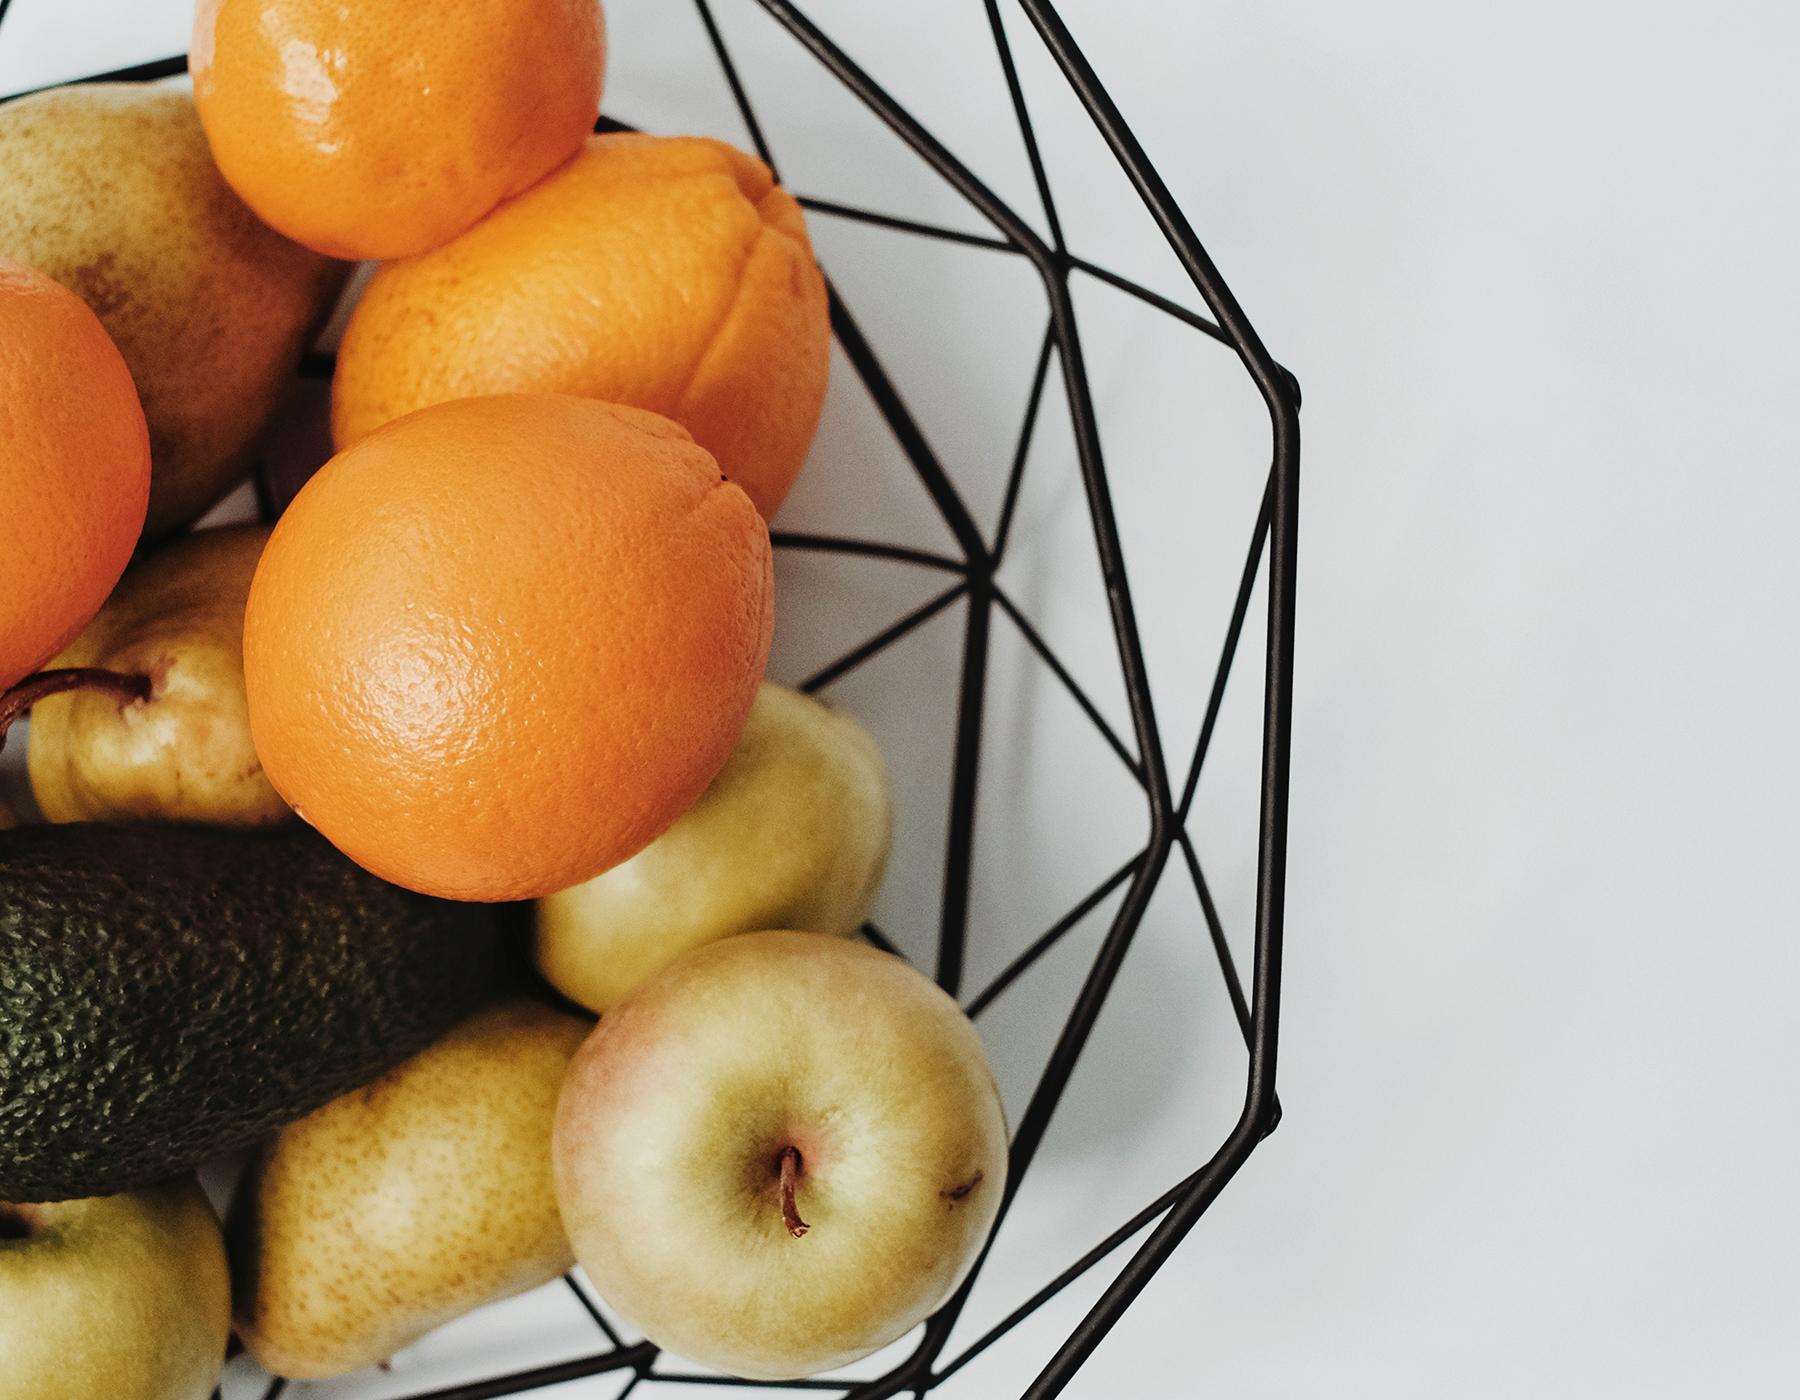 Een fruitmand vol sinaasappels, appels en peren.